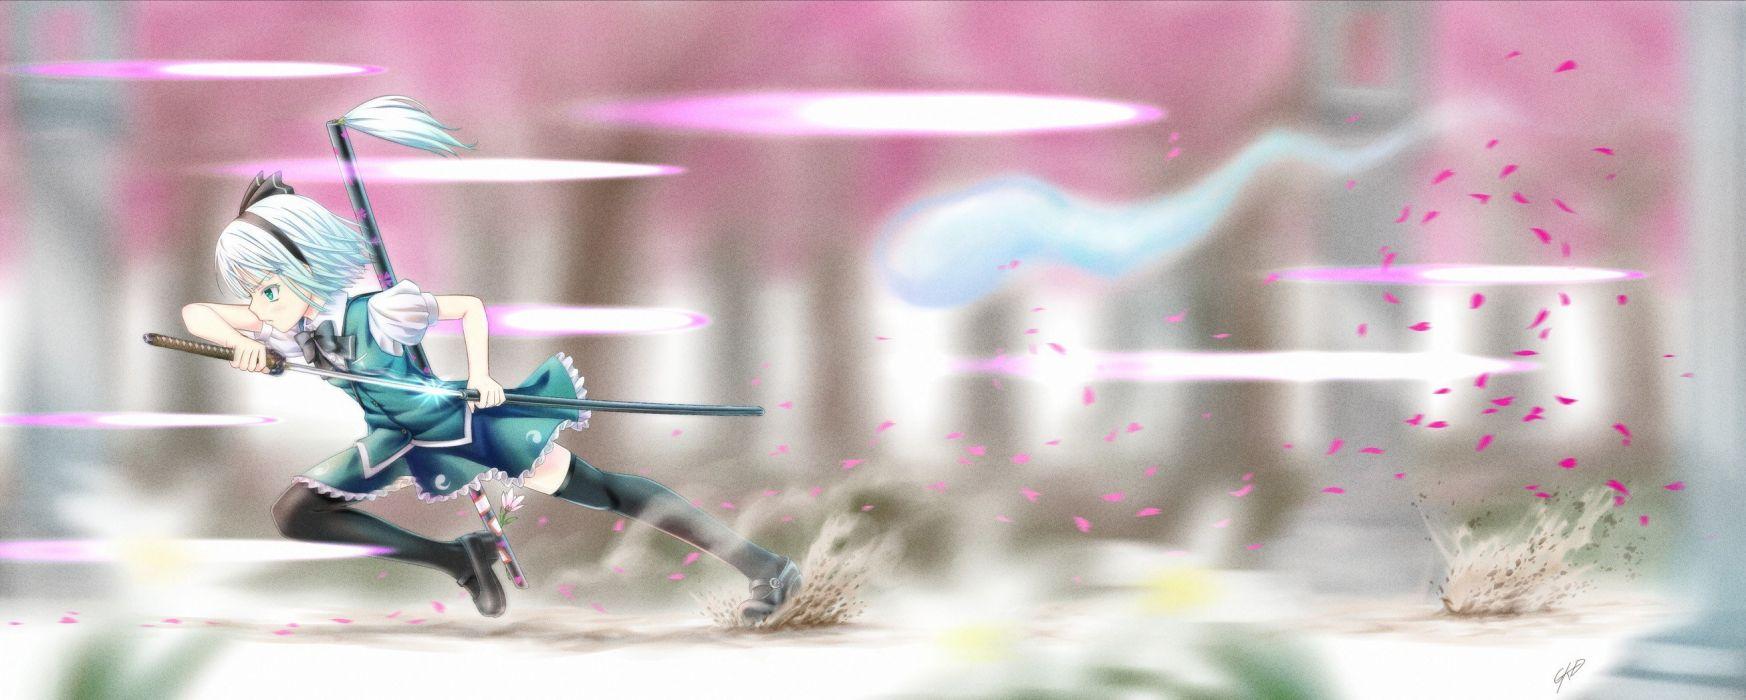 video games Touhou katana weapons Konpaku Youmu short hair thigh highs anime white hair multiscreen hair band swords wallpaper